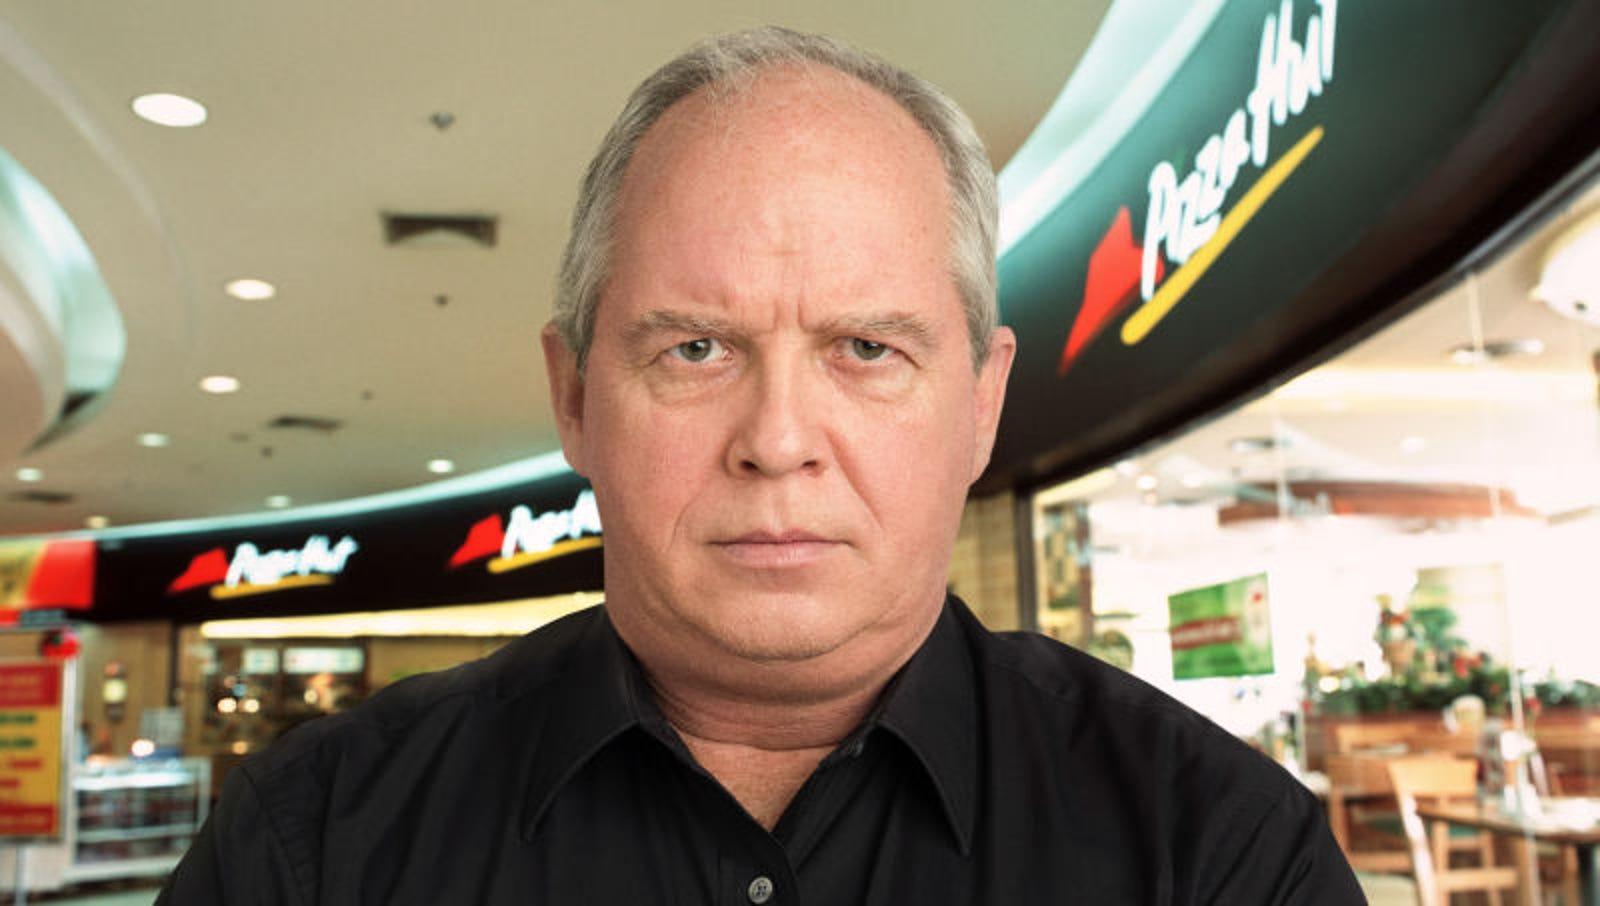 Man Annoyed By Travel Plaza's Abridged Pizza Hut Menu